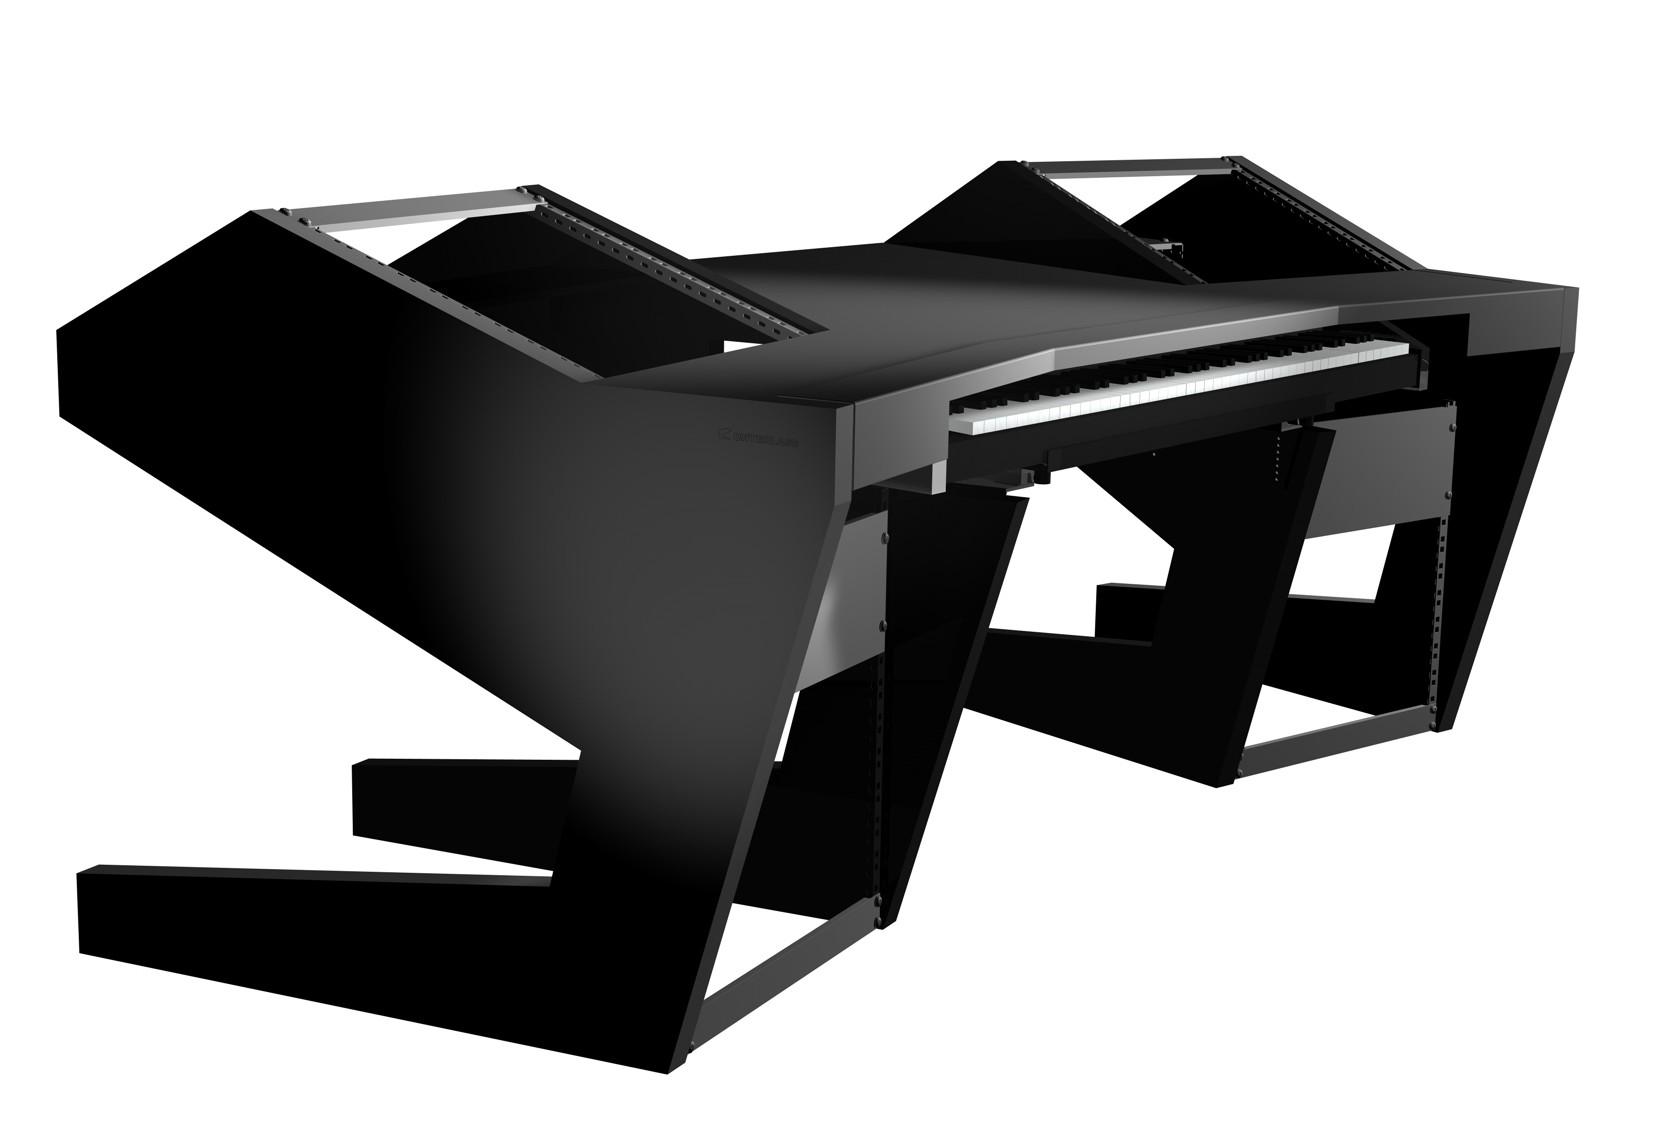 Unterlass Duodesk Key 60 Studio Furniture Available Now